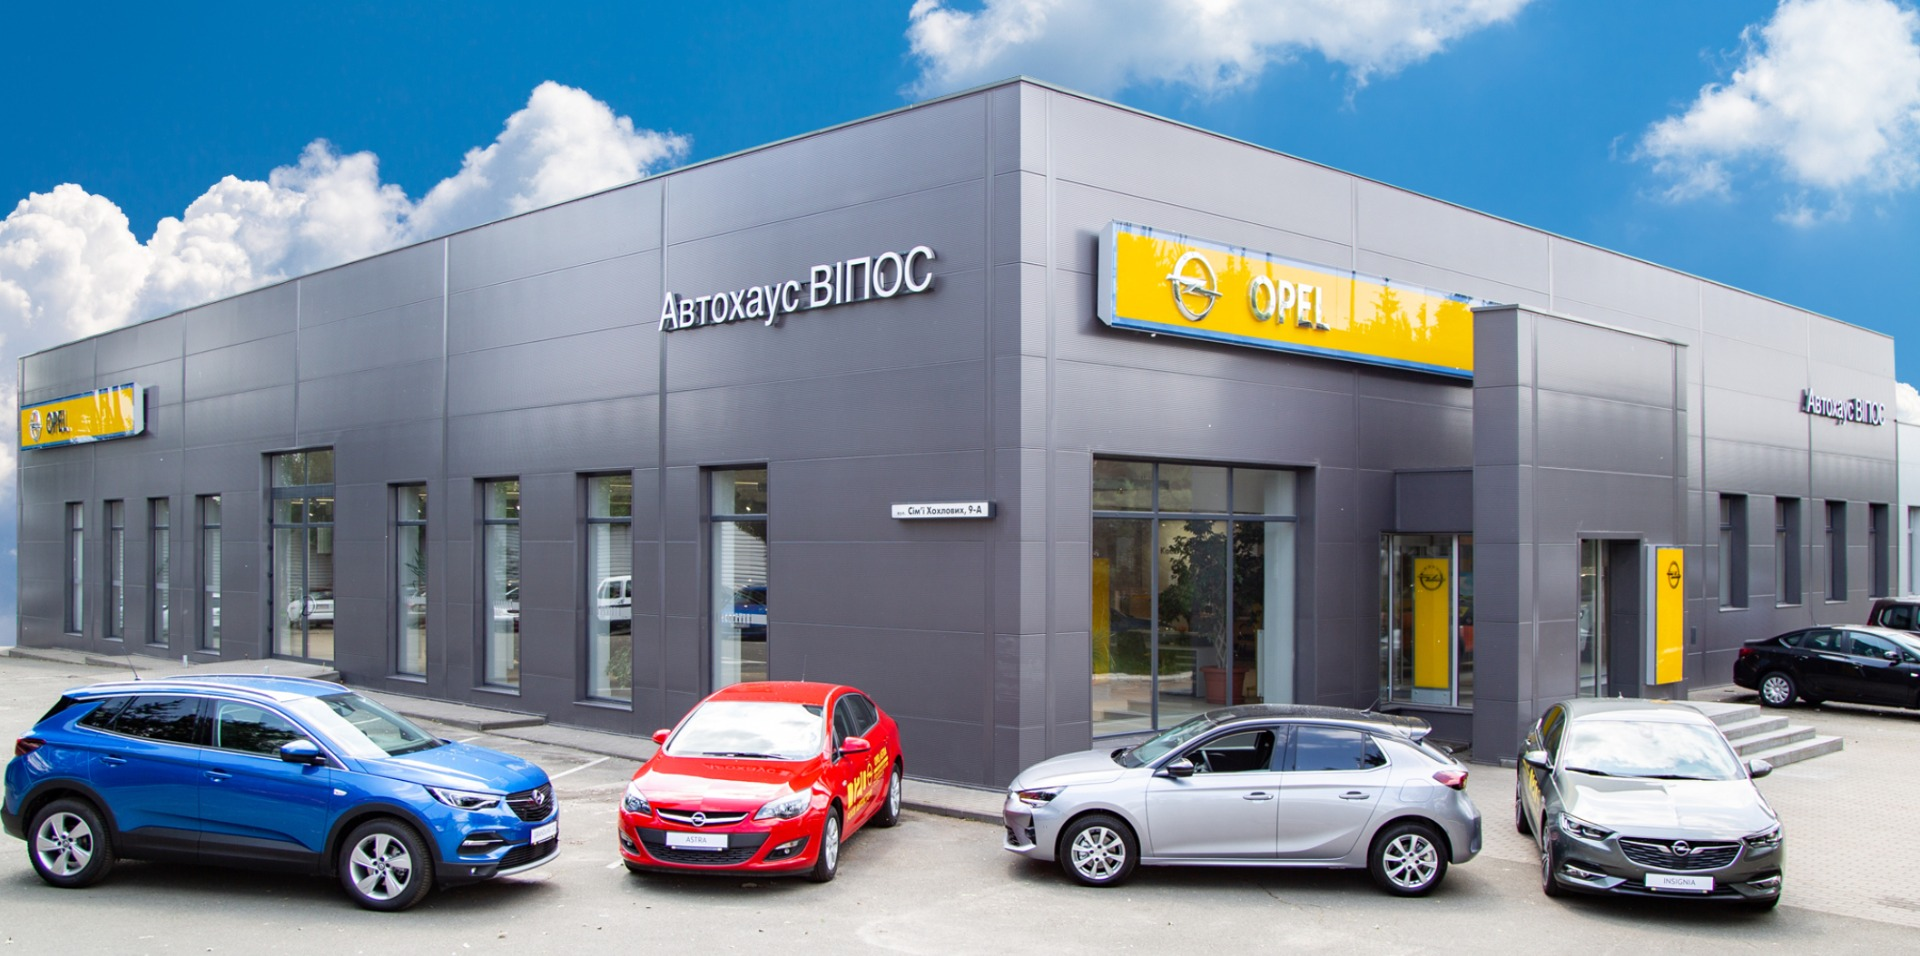 Opel Центр Київ «Автохаус Віпос»